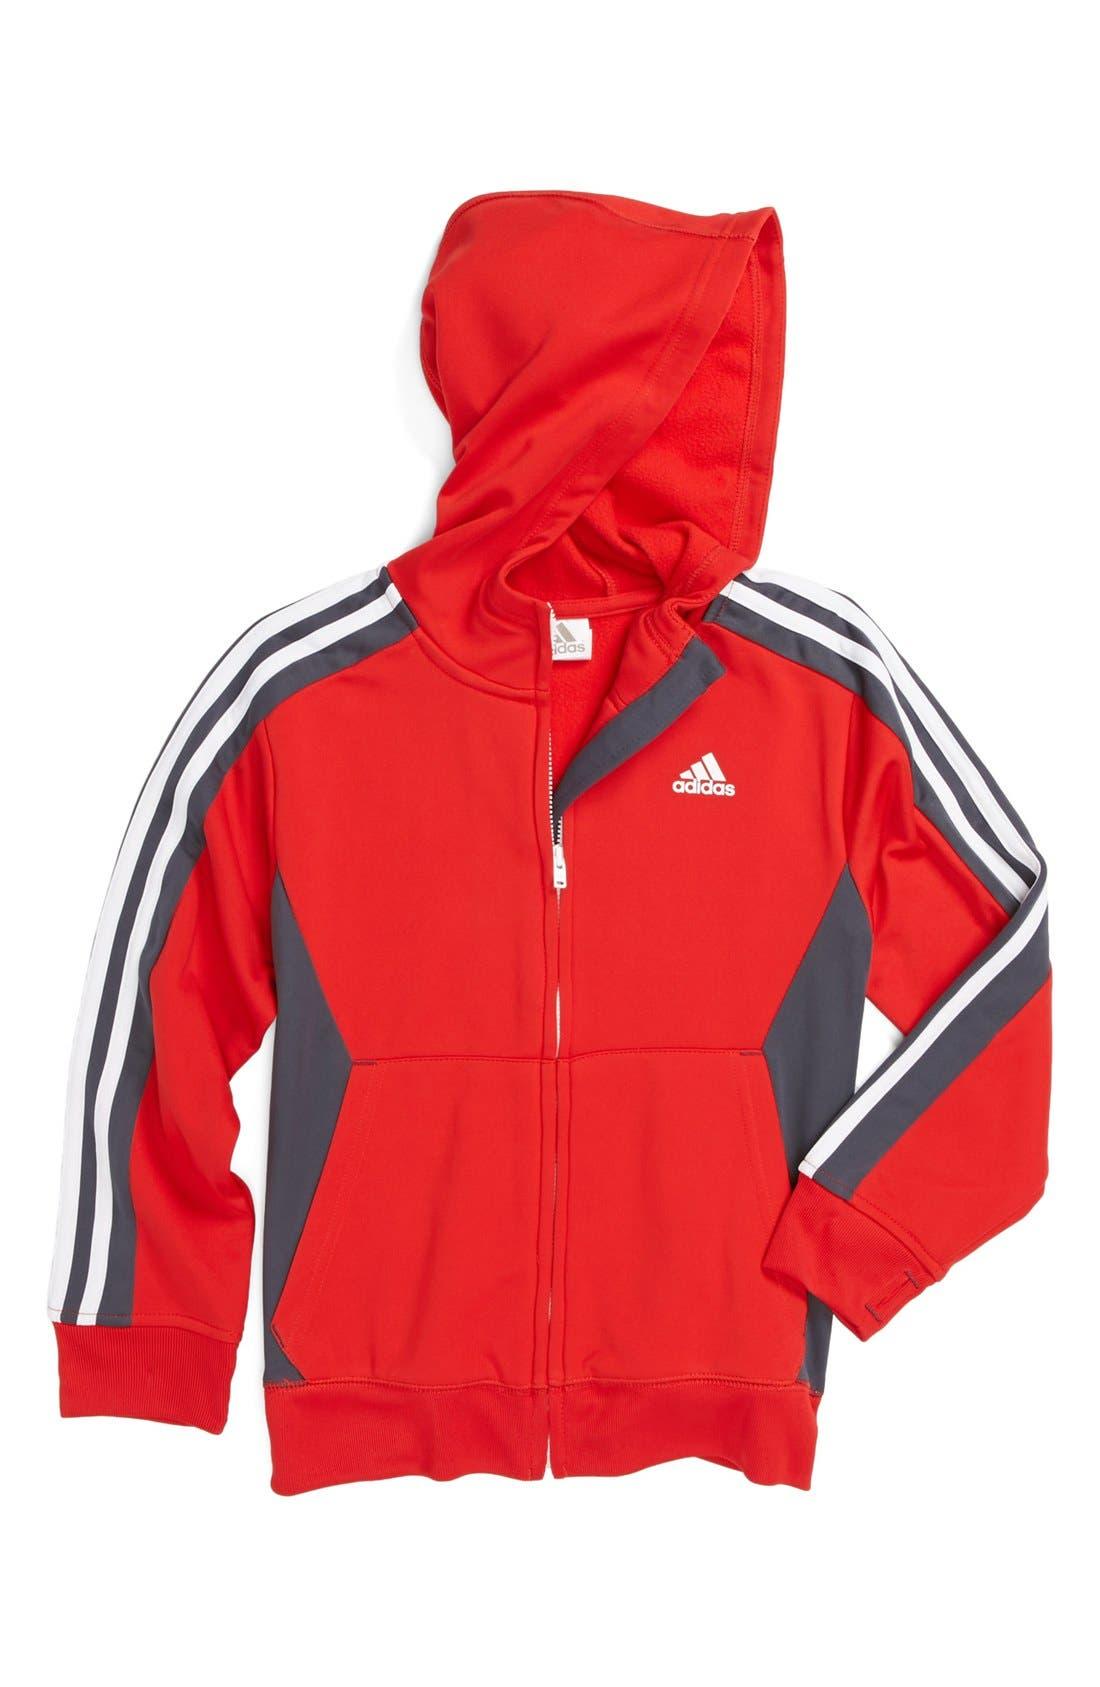 Alternate Image 1 Selected - adidas 'Prime' Jacket (Little Boys)